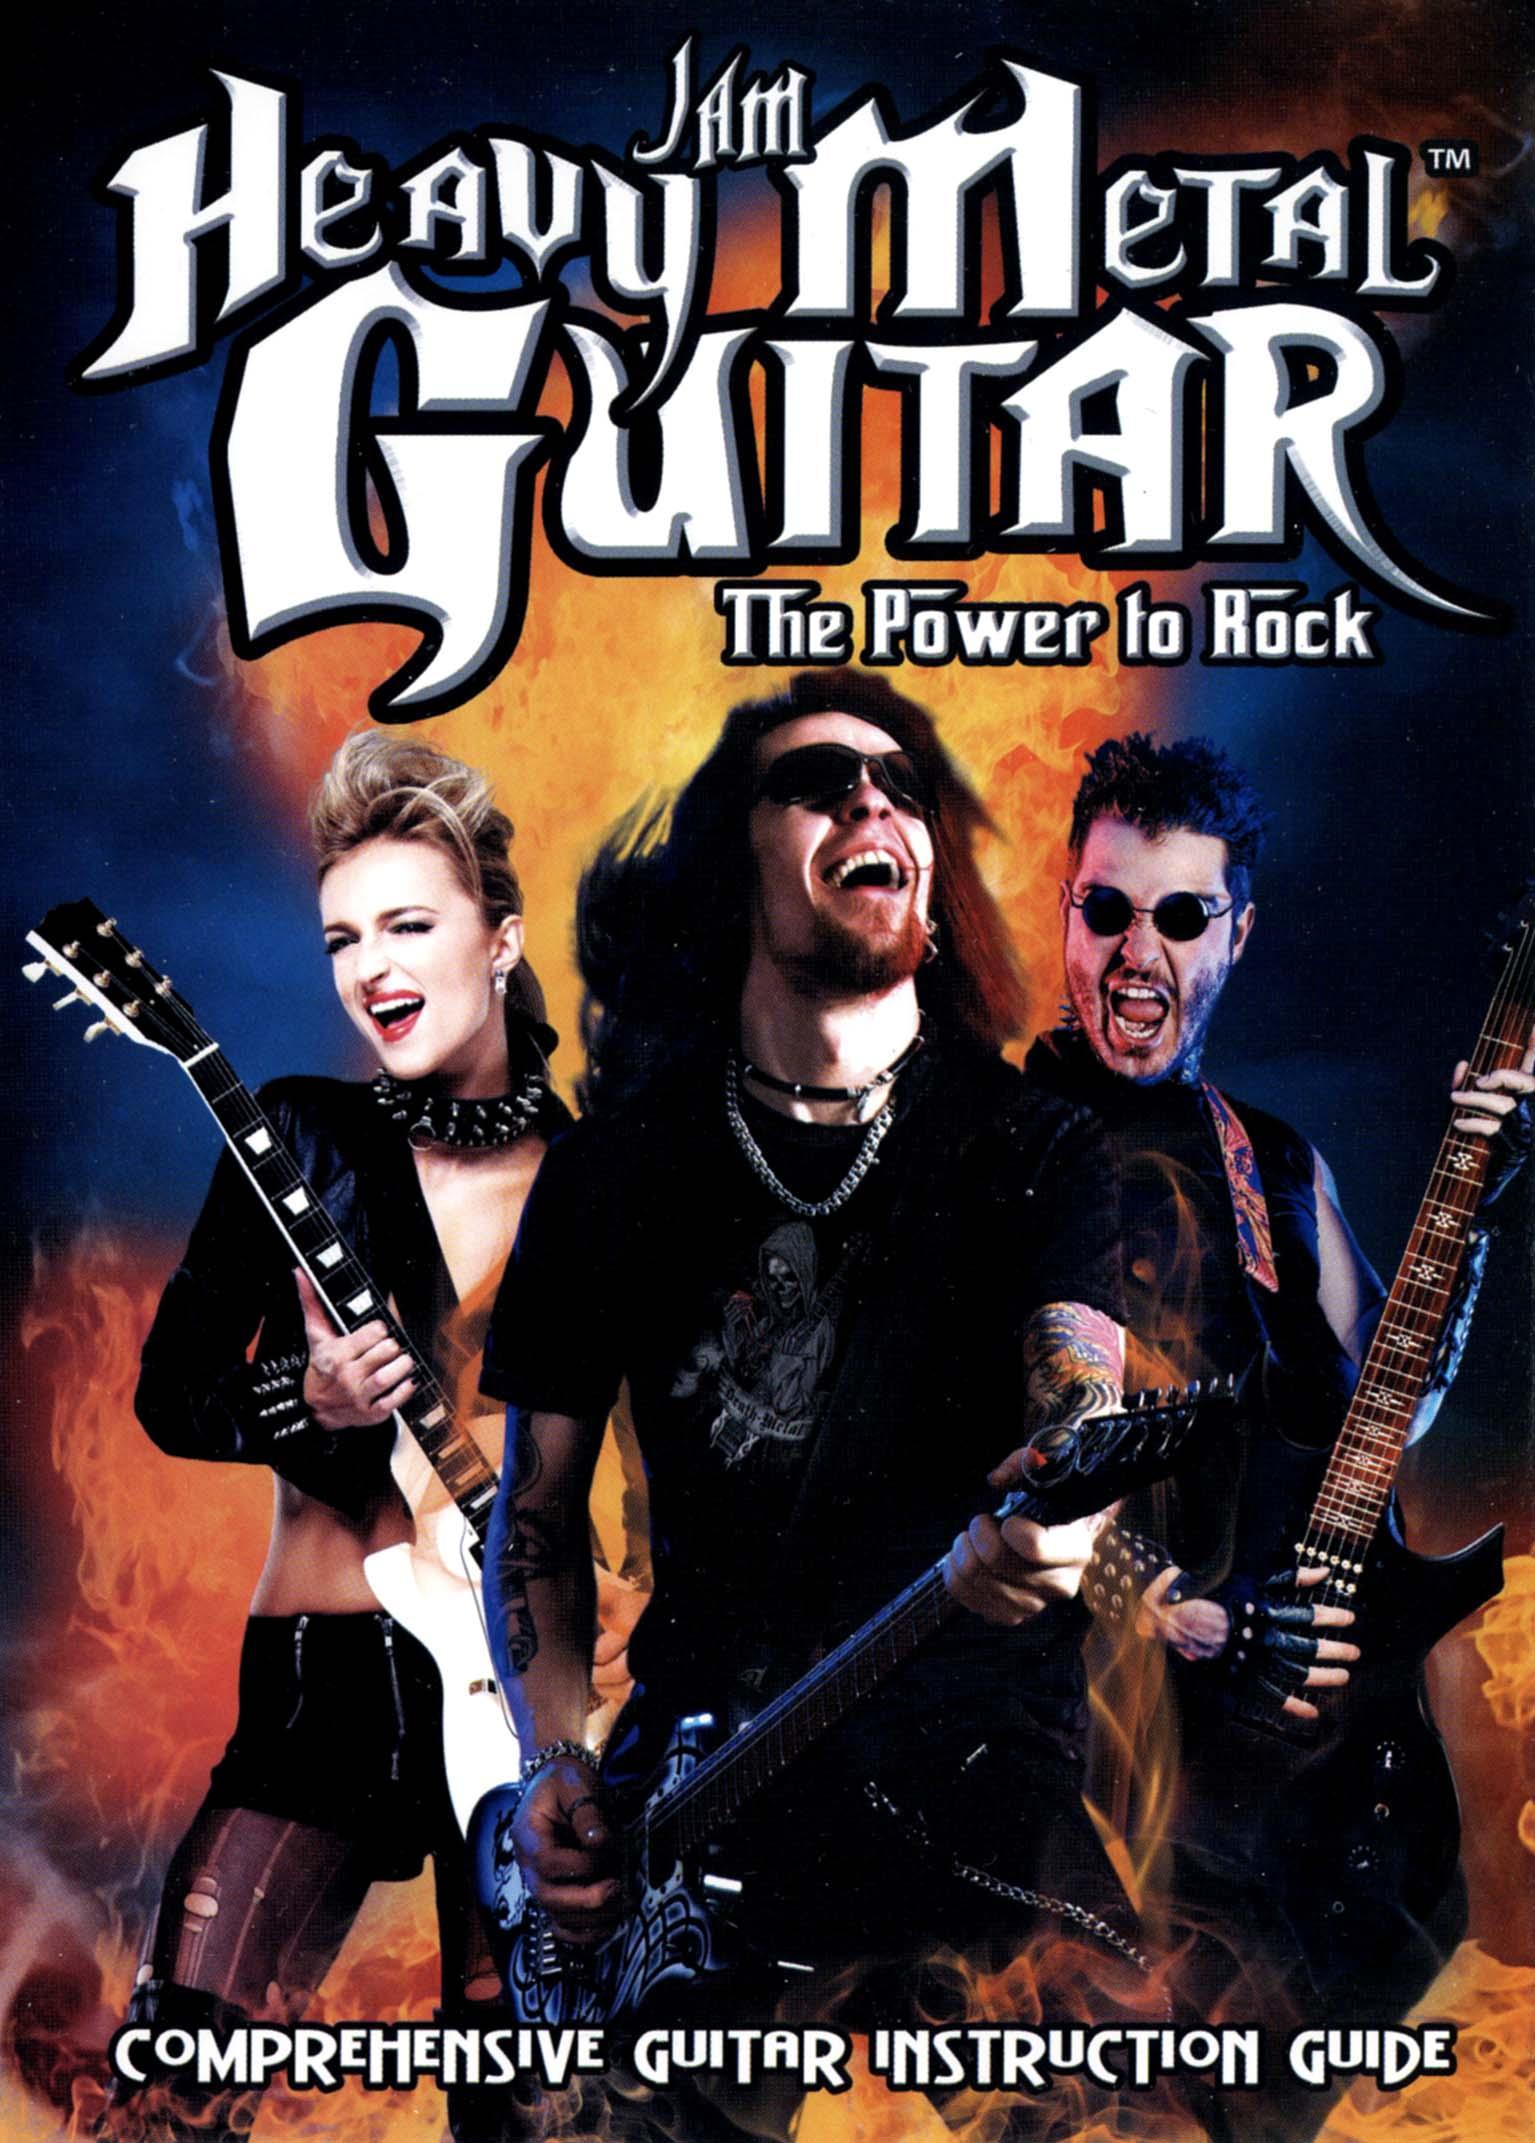 Jam Heavy Metal Guitar: The Power to Rock